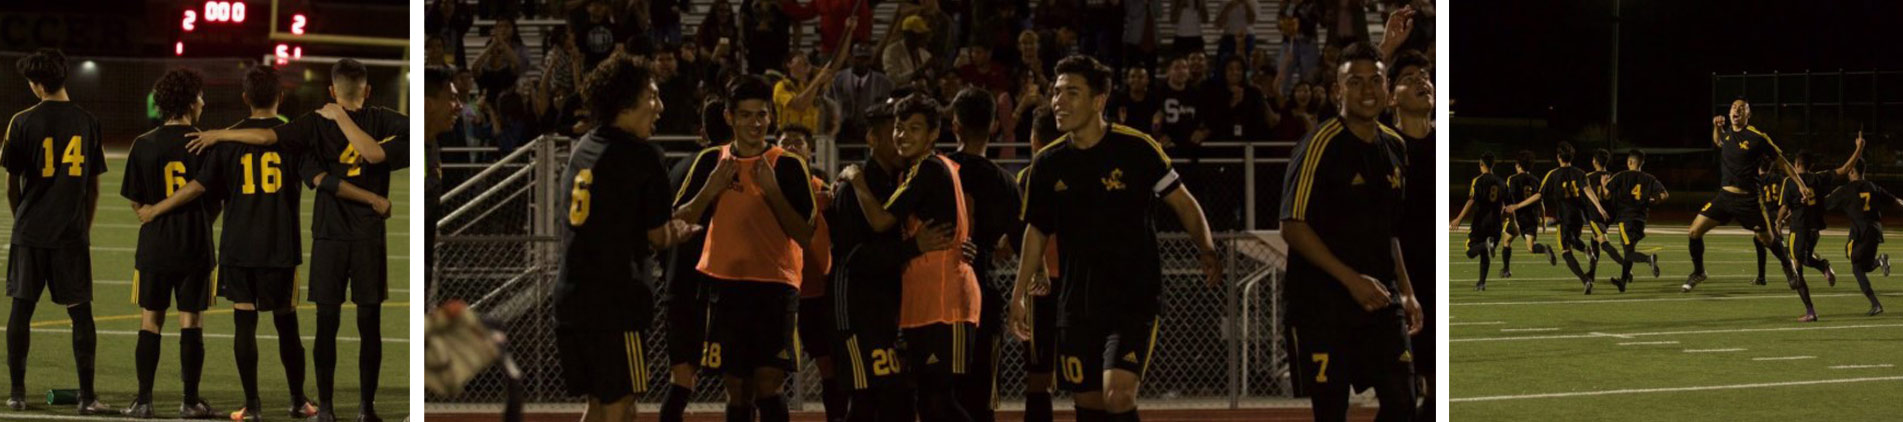 Soccer Semifinal Game